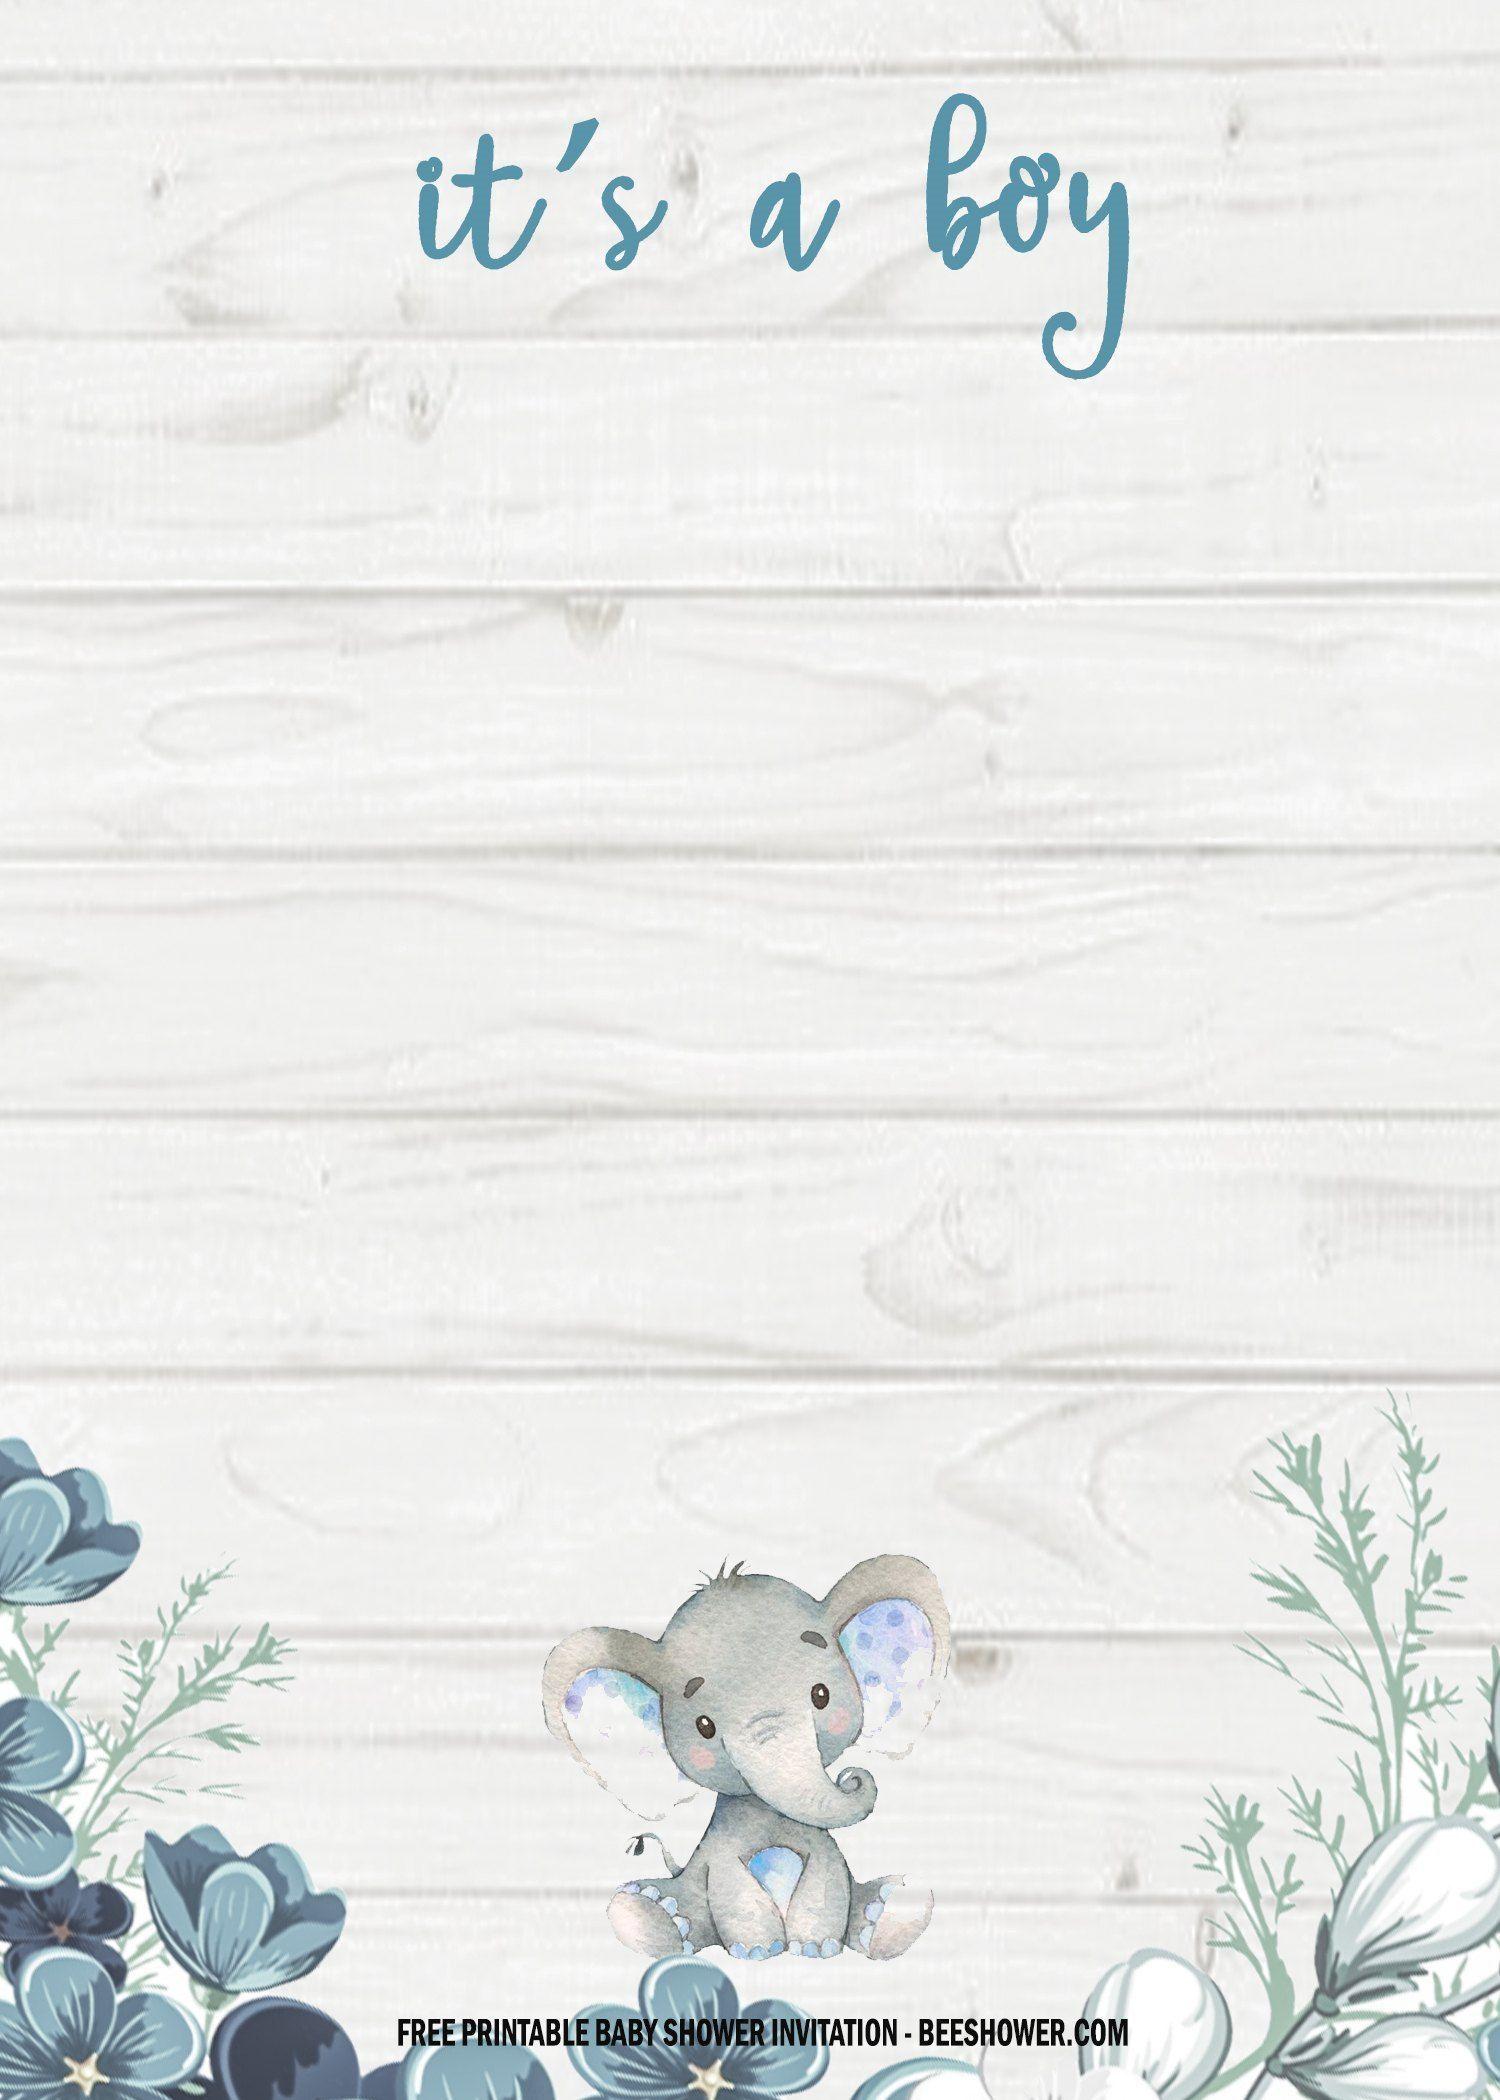 004 Amazing Elephant Baby Shower Invitation Template Concept  Templates Free Pdf BoyFull